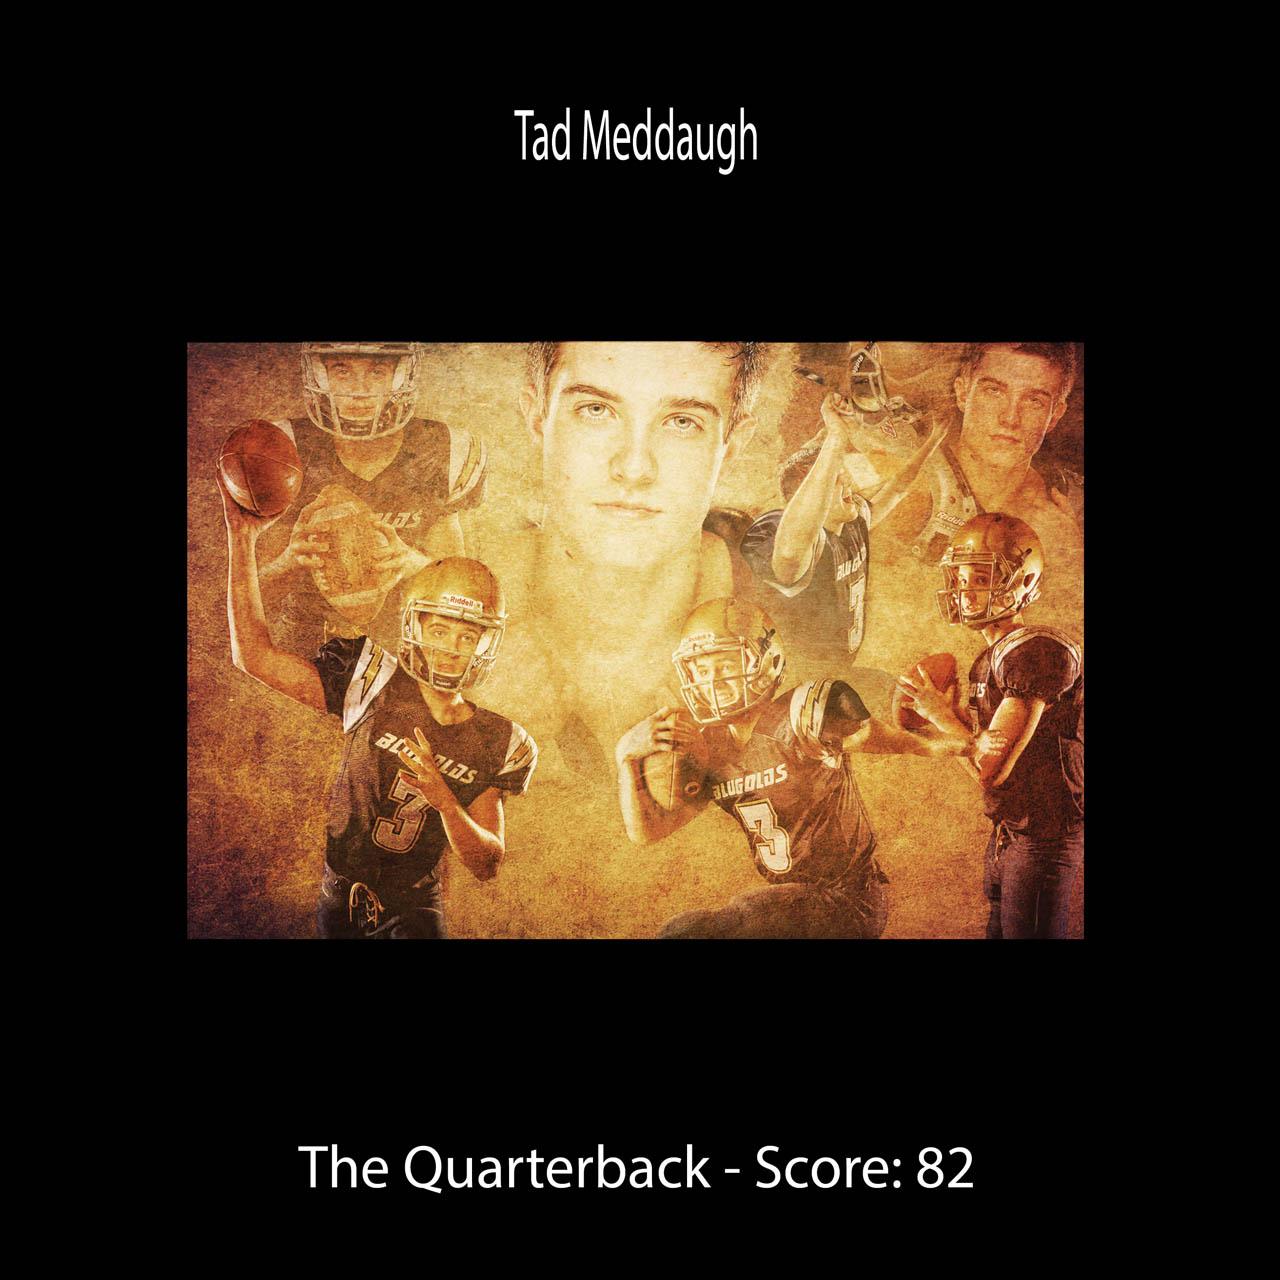 Page 26 Meddaugh The Quarterback